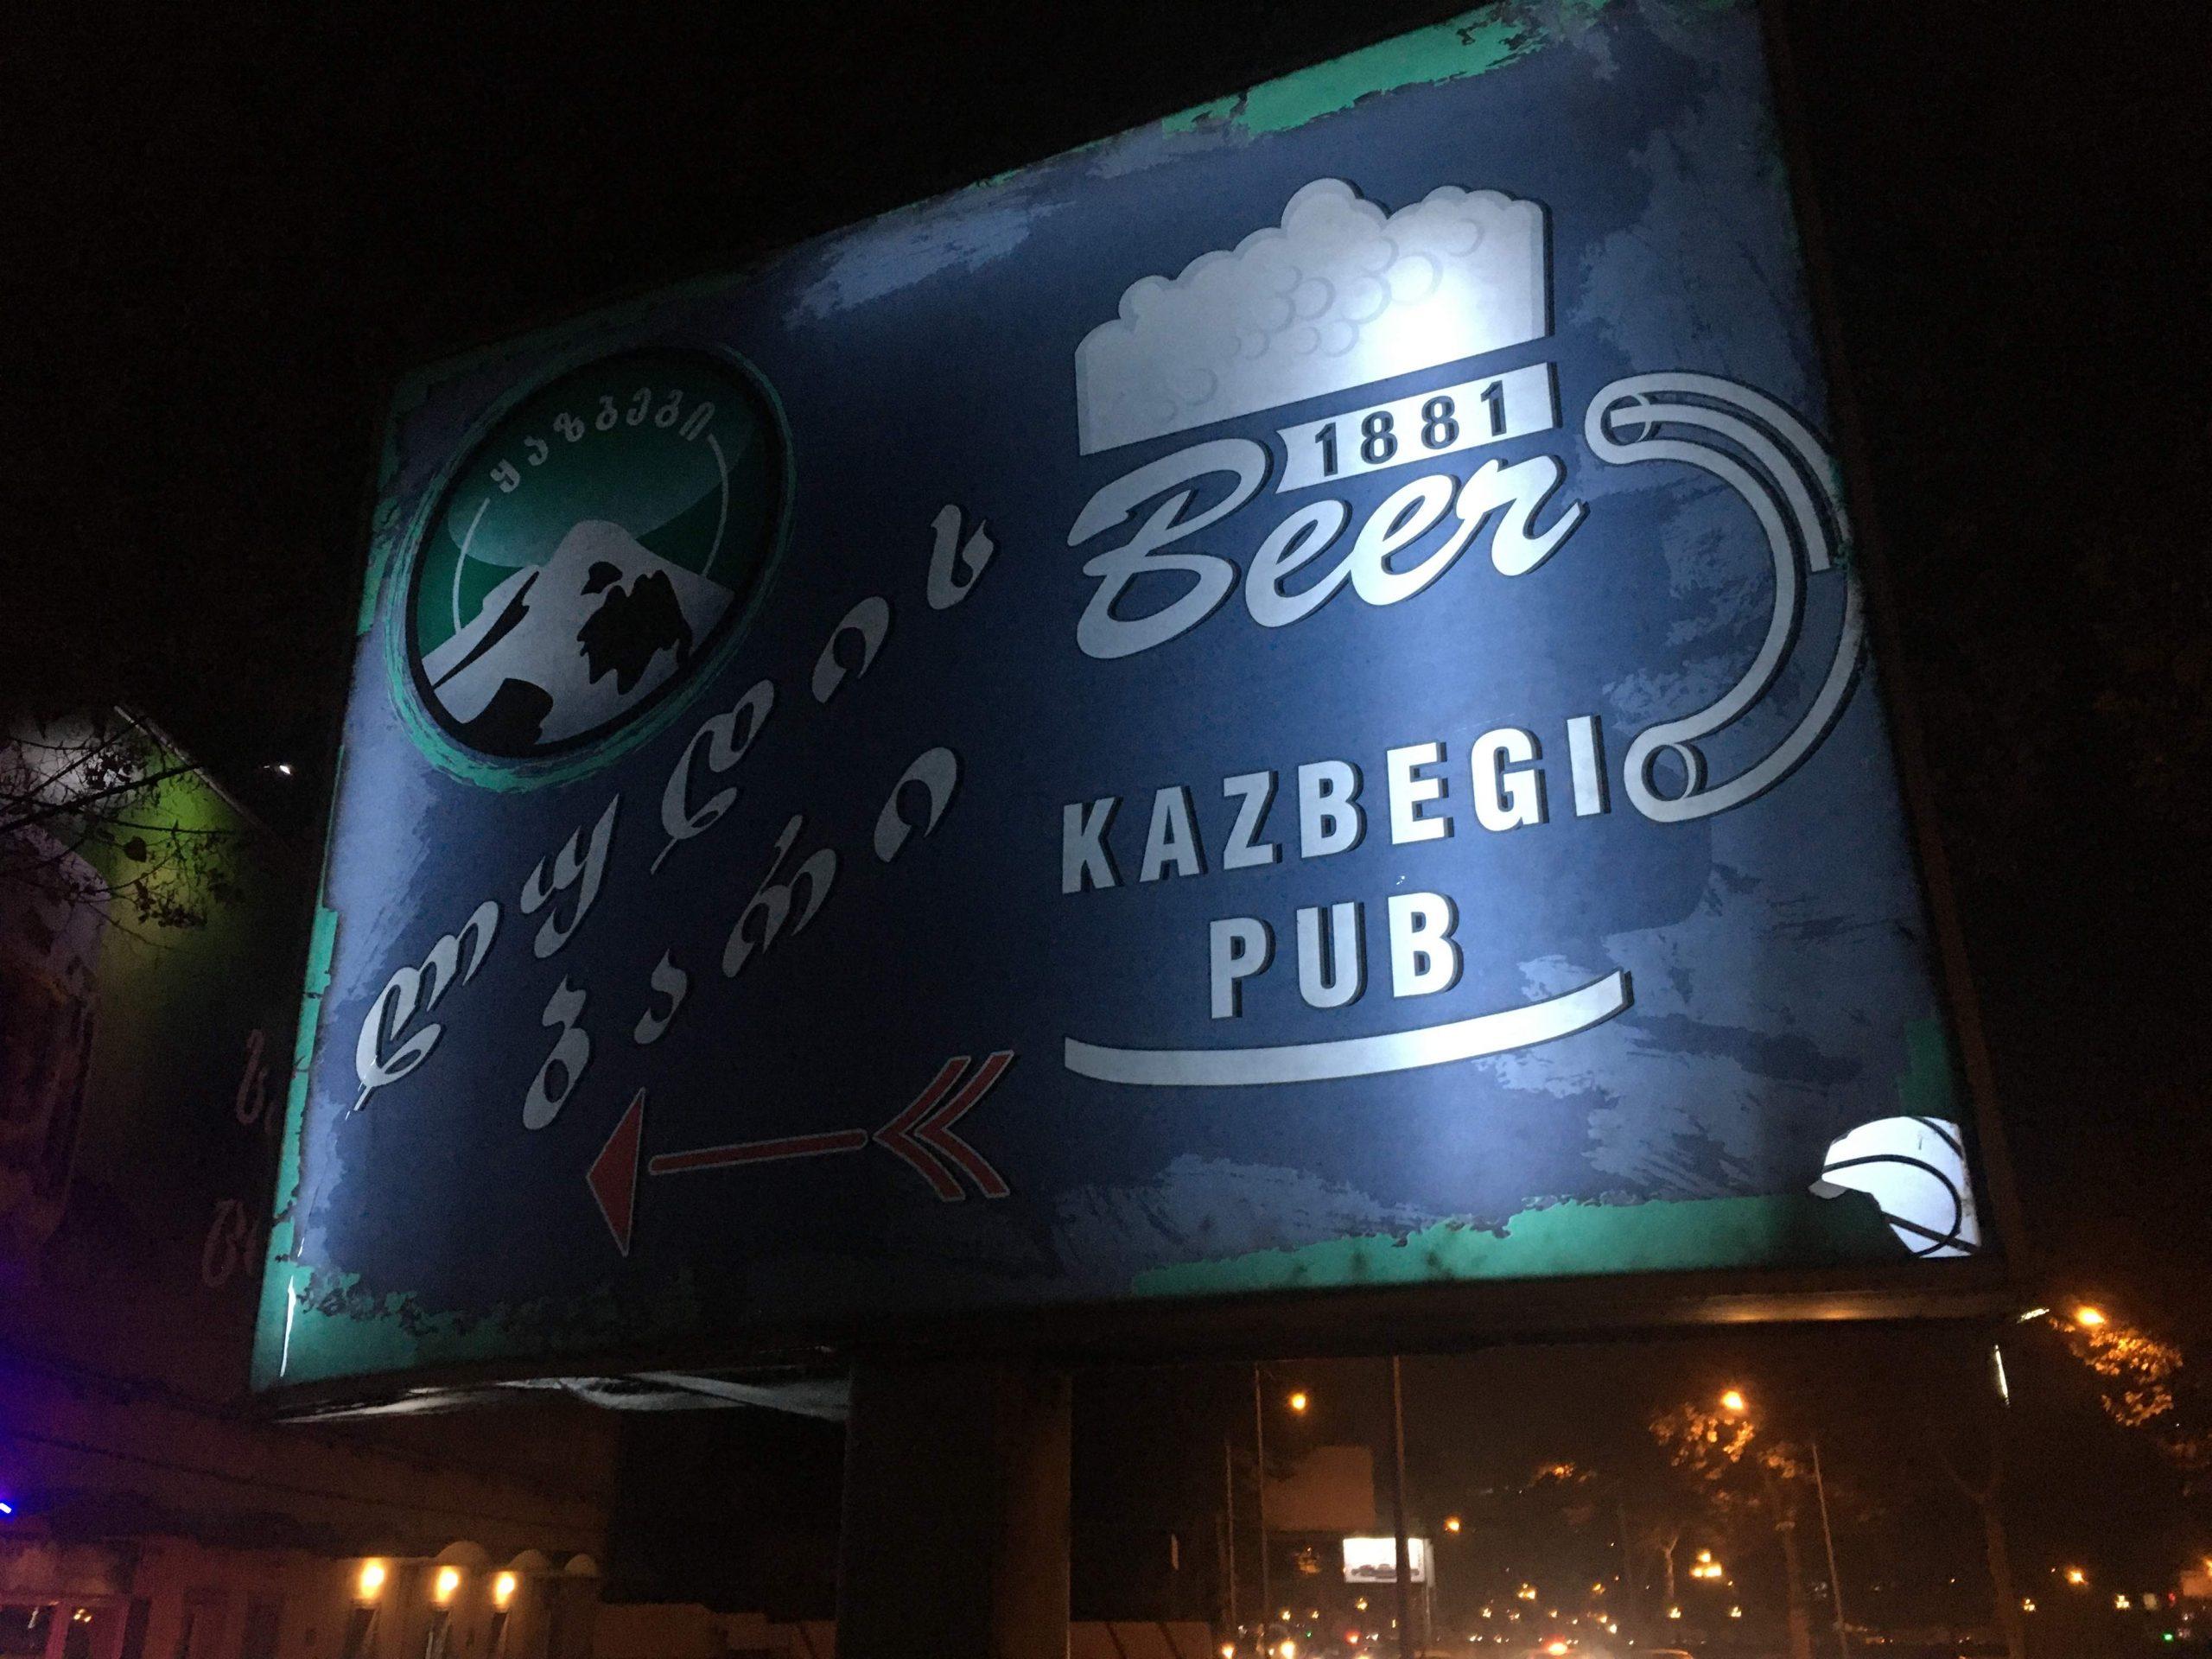 Kazbegi Beerの看板